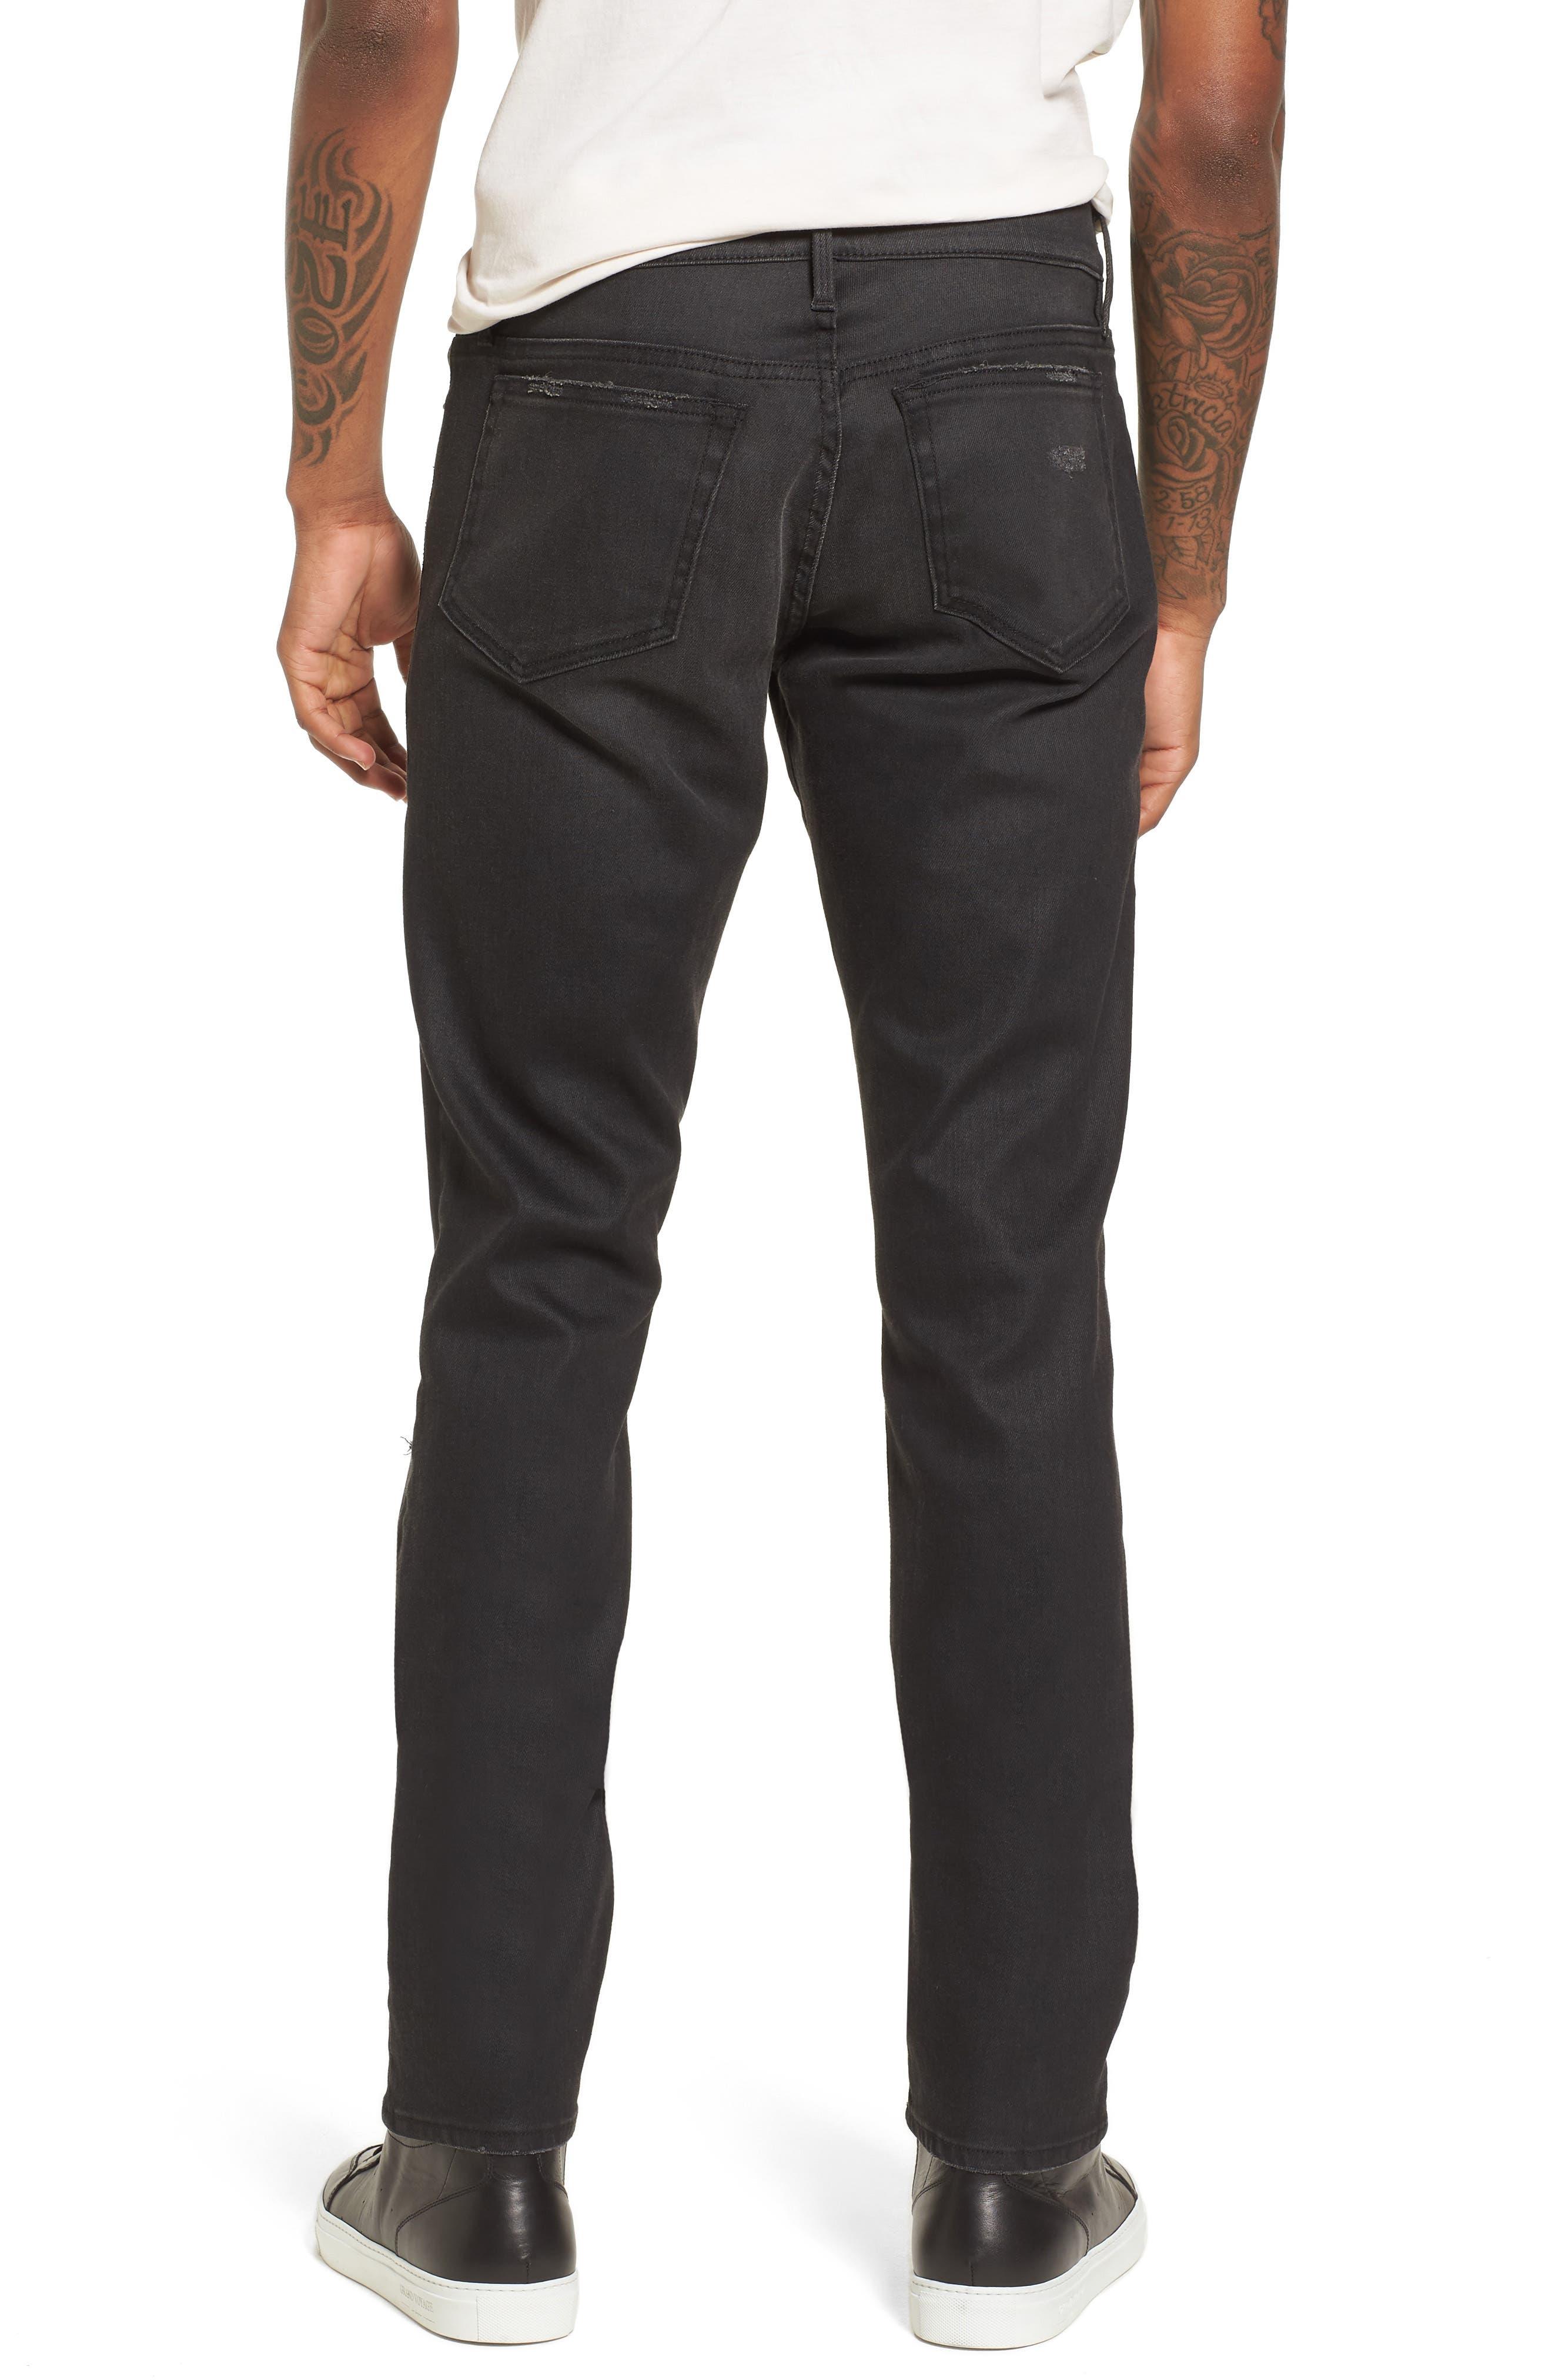 L'Homme Slim Fit Jeans,                             Alternate thumbnail 2, color,                             Flintwood